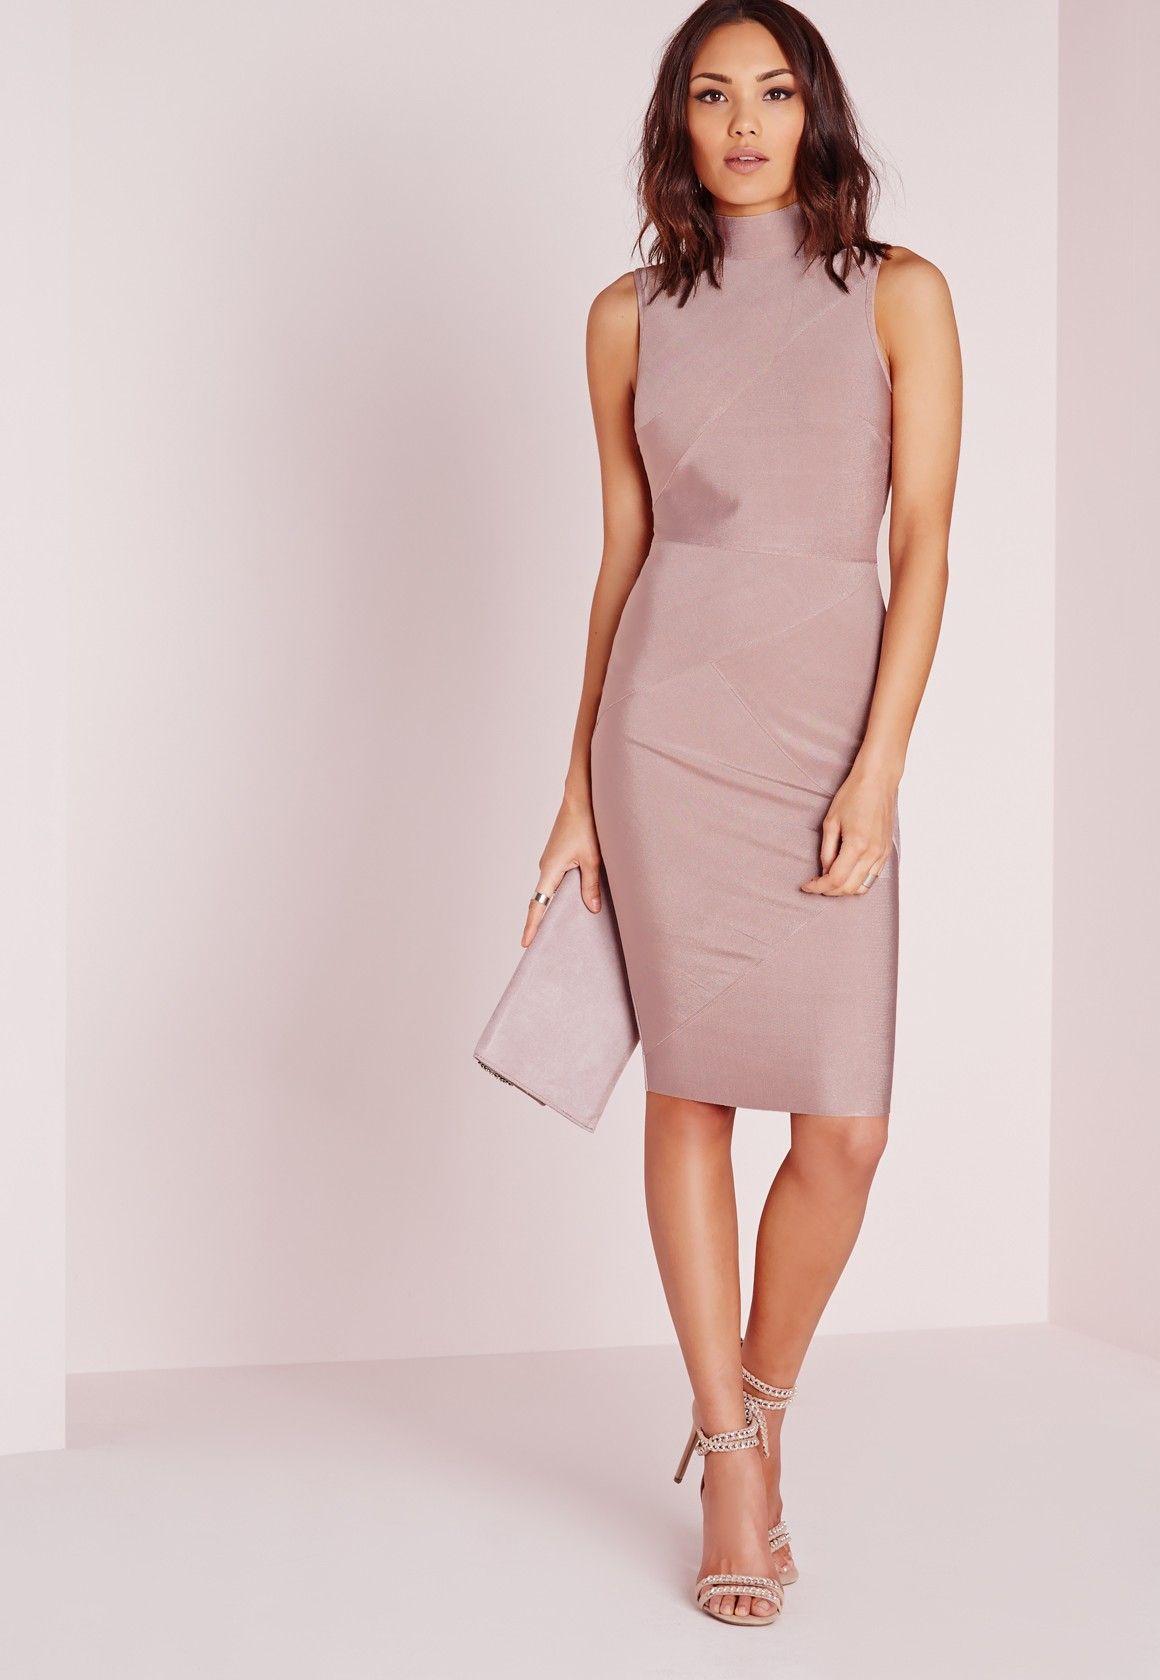 Missguided - Premium Bandage High Neck Midi Dress Mauve | Vestes ...